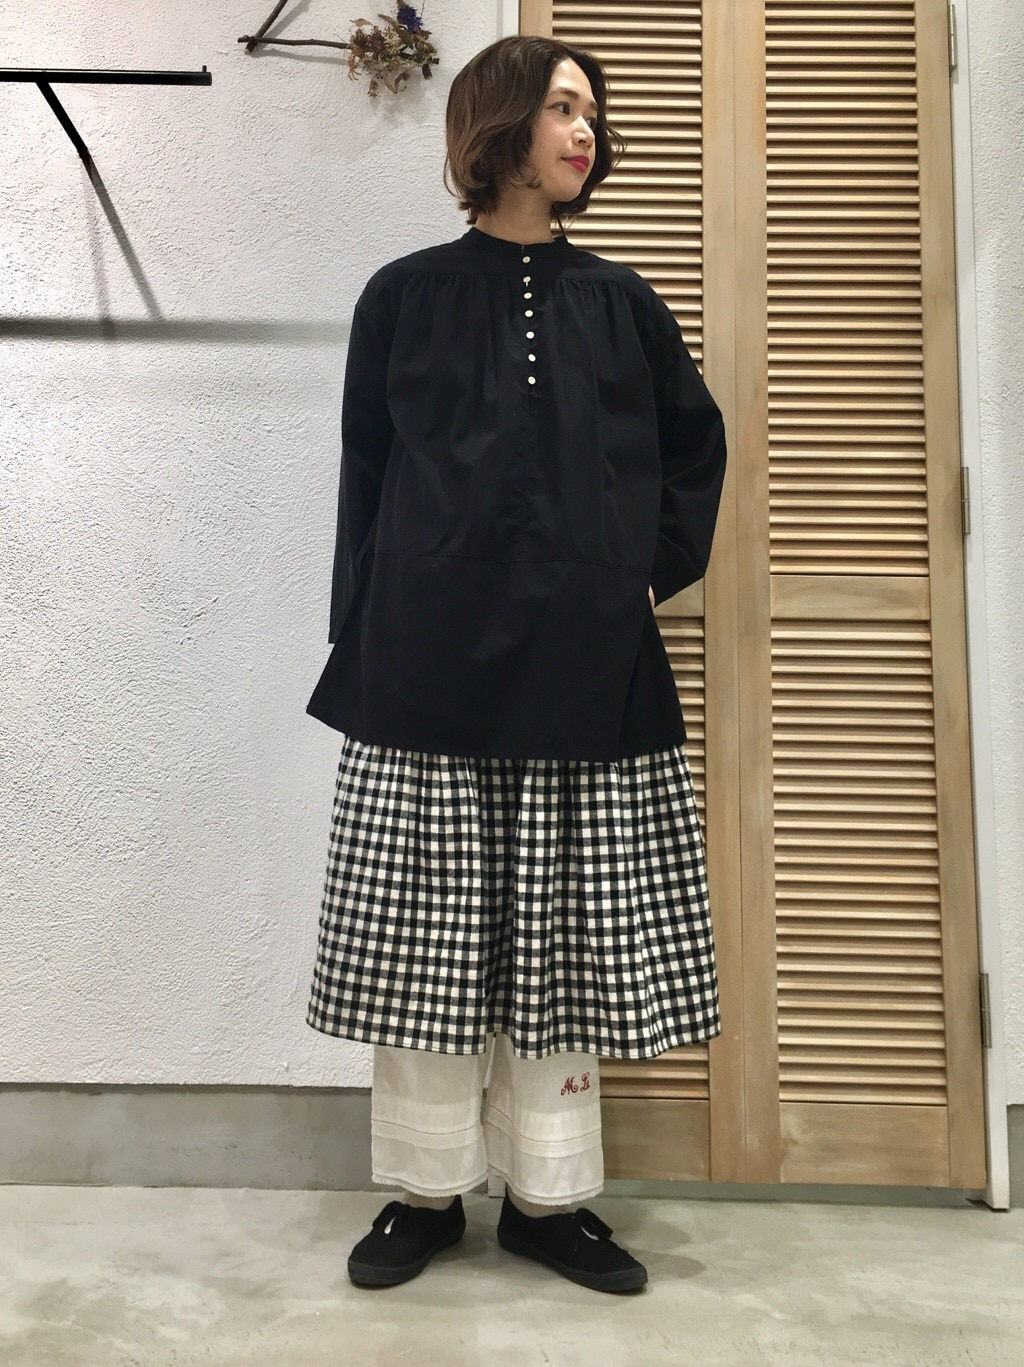 chambre de charme 横浜ジョイナス 身長:160cm 2021.02.11